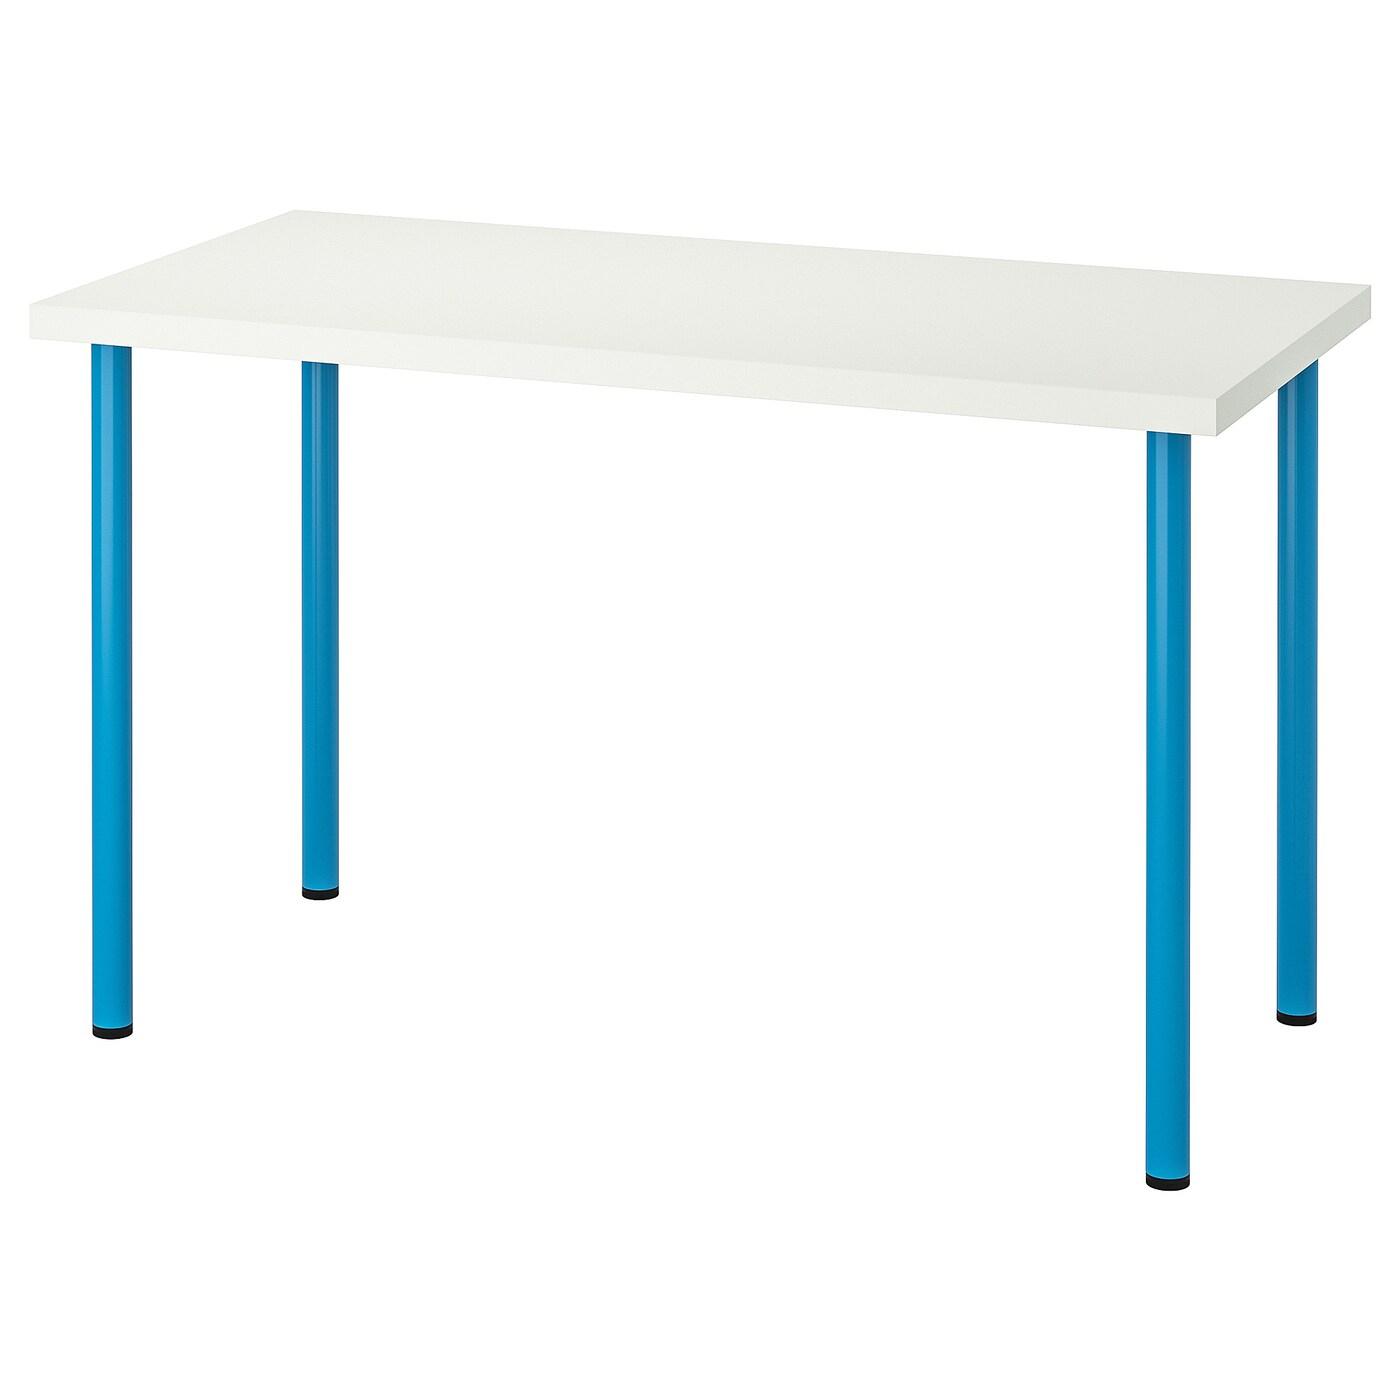 Ikea Linnmon / Adils Table Noir Brun-Noir 120X60 Cm Meubles ... destiné Ikea Meubles De Jardin